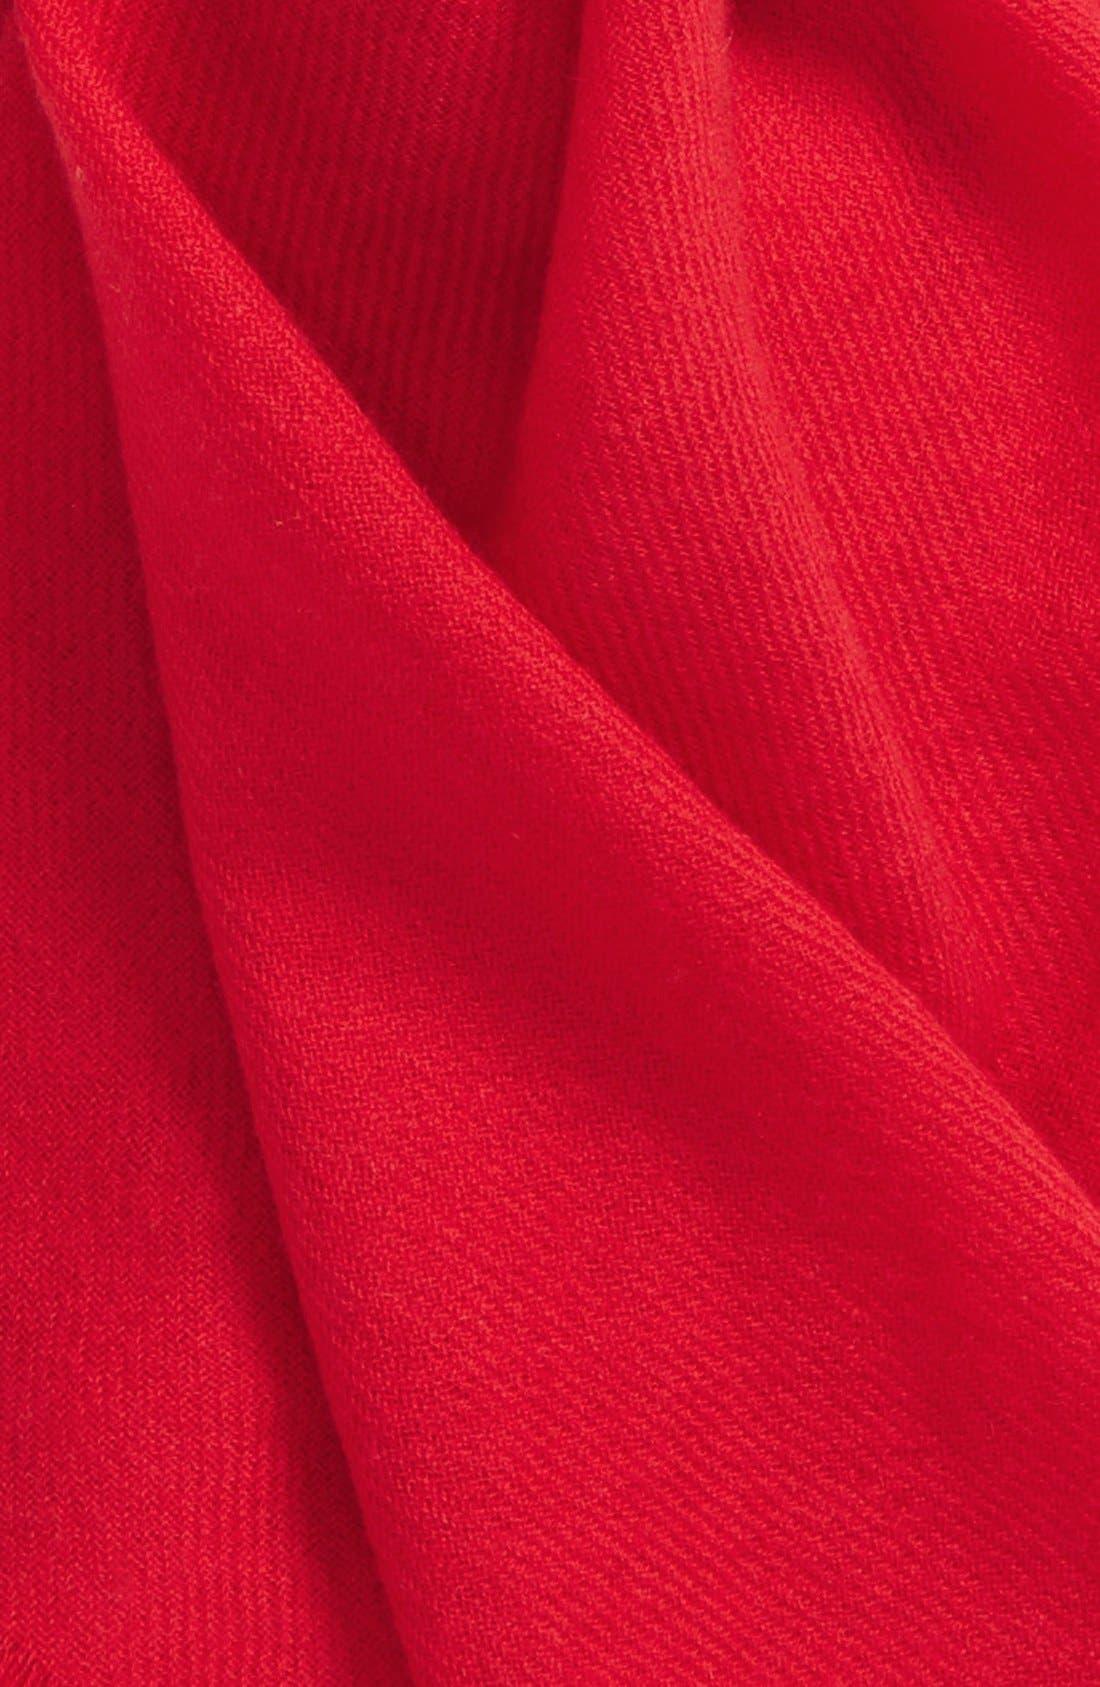 Wool & Cashmere Wrap,                             Alternate thumbnail 58, color,